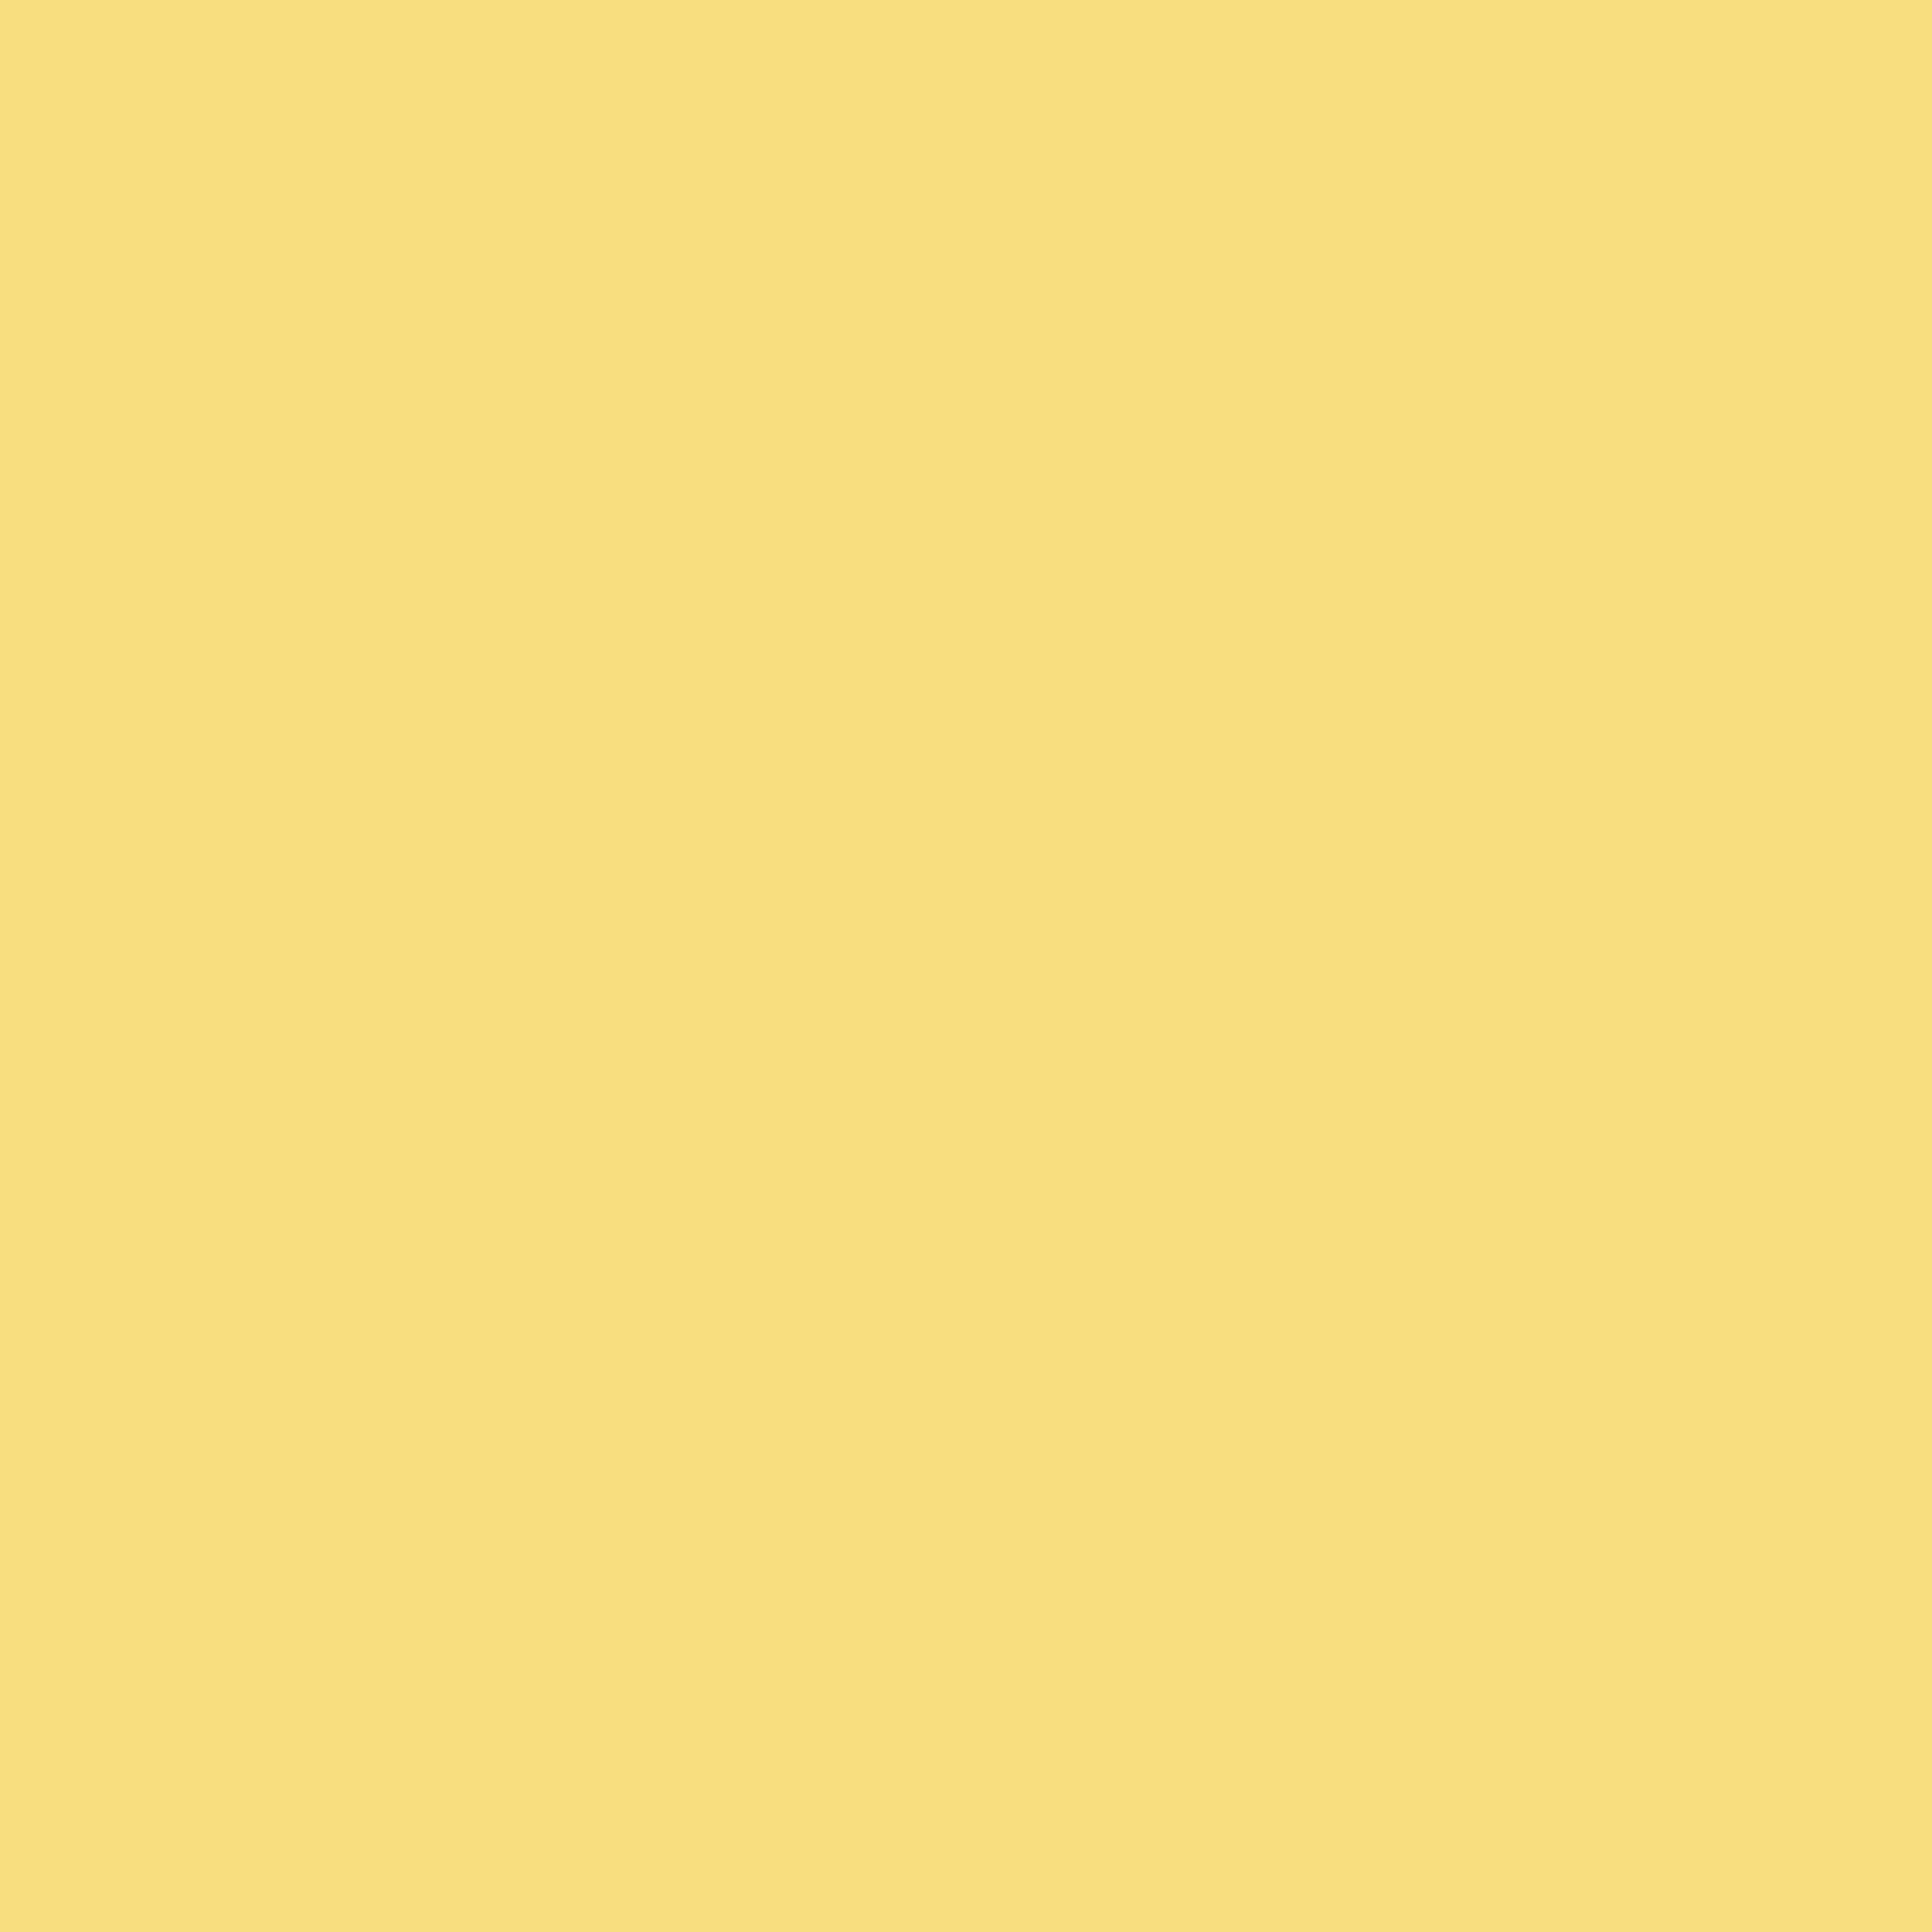 2048x2048 Jasmine Solid Color Background